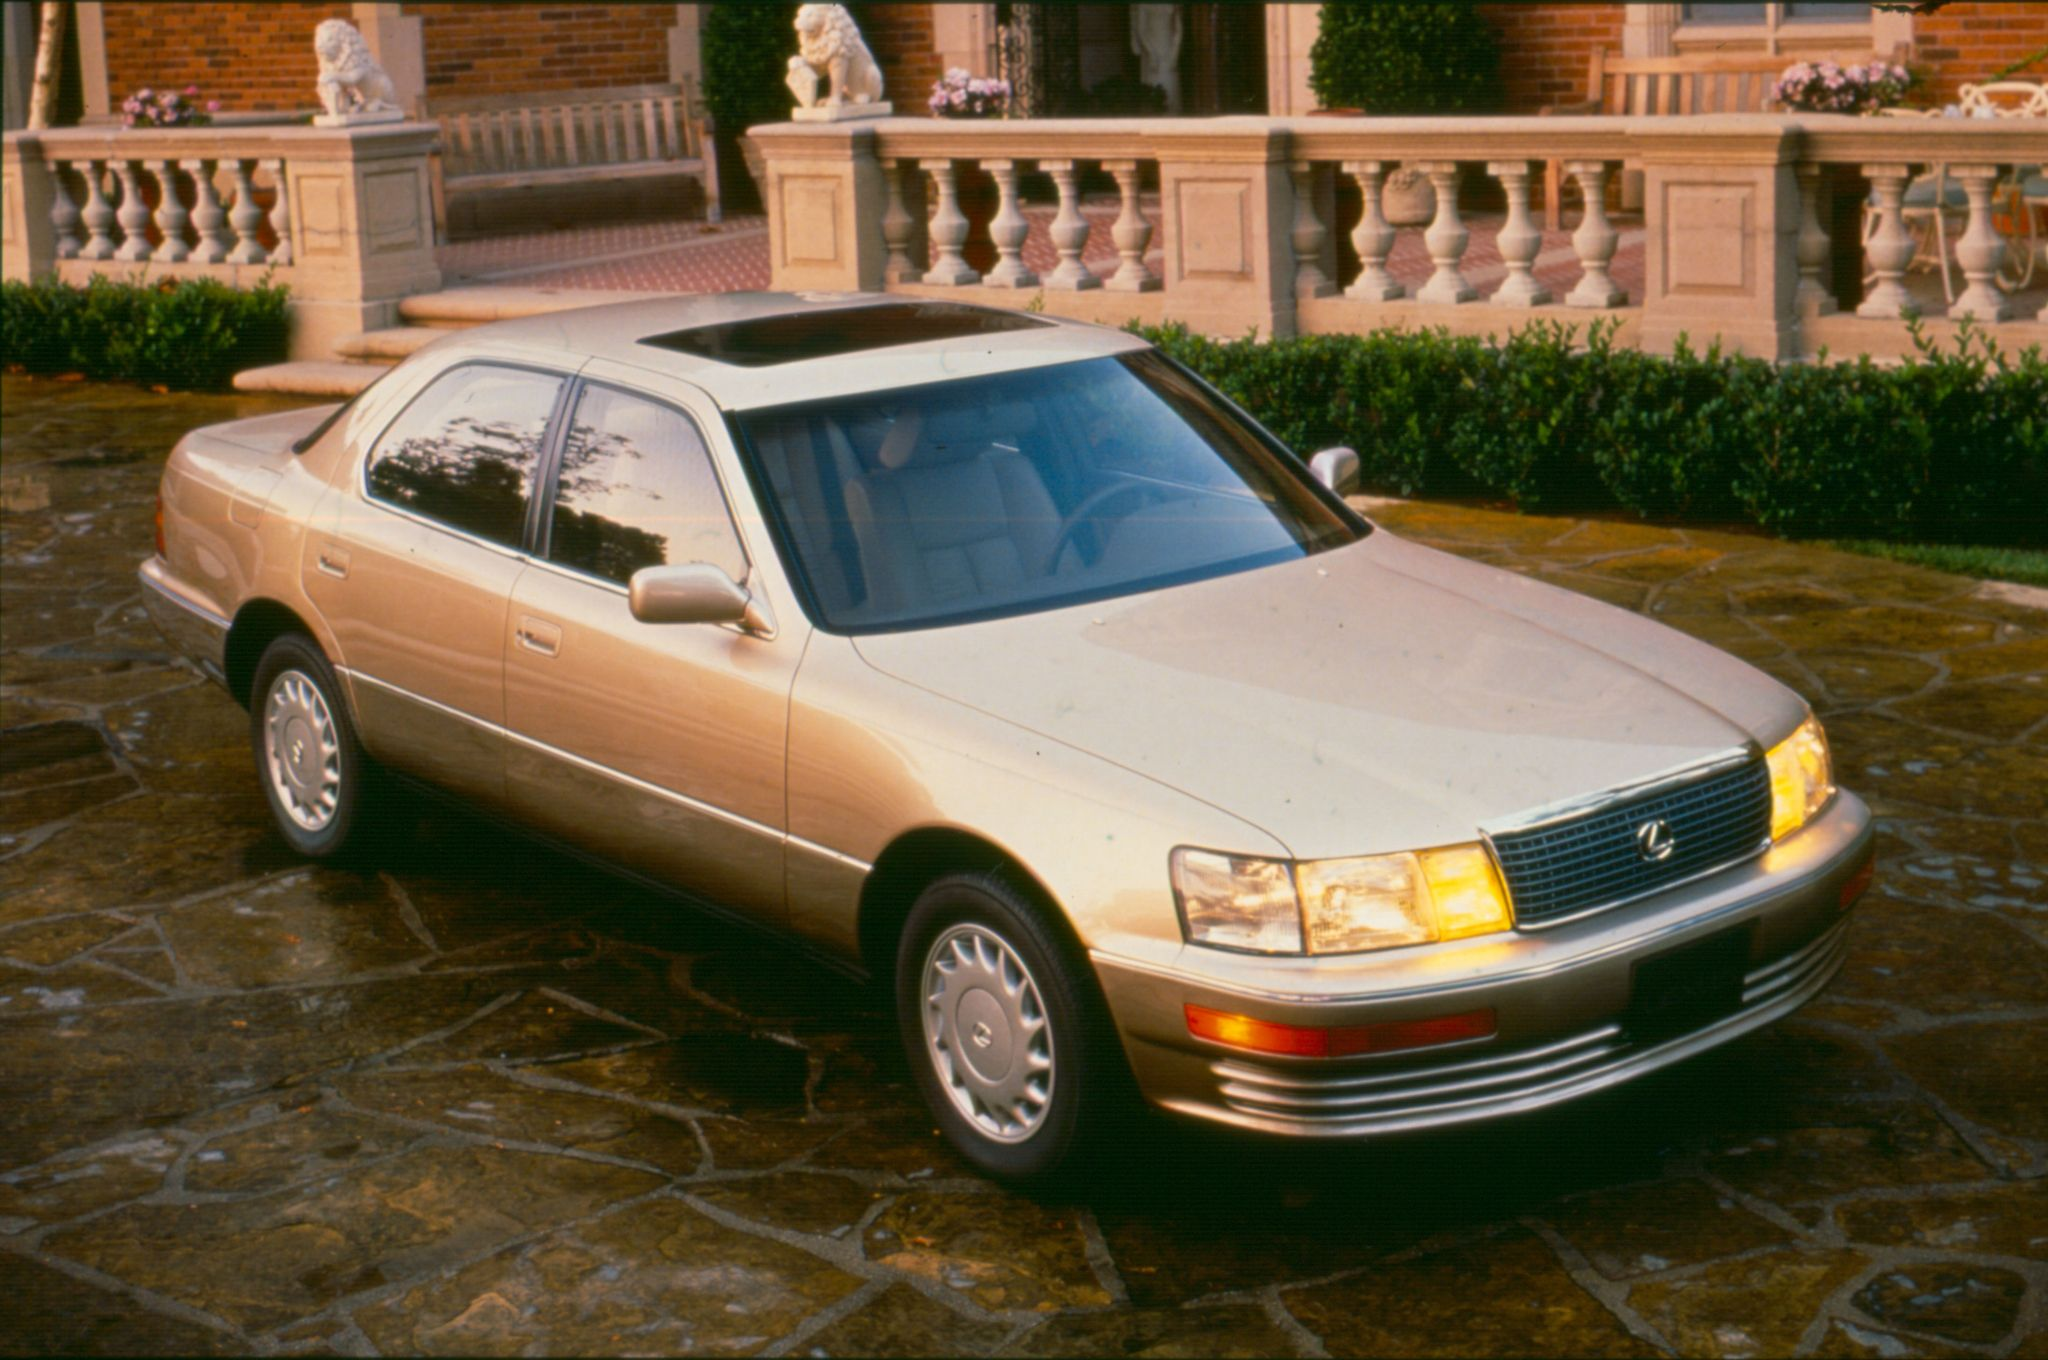 1990 became a fantastic year to own a lexus lexusls400 ls400 [ 2048 x 1360 Pixel ]